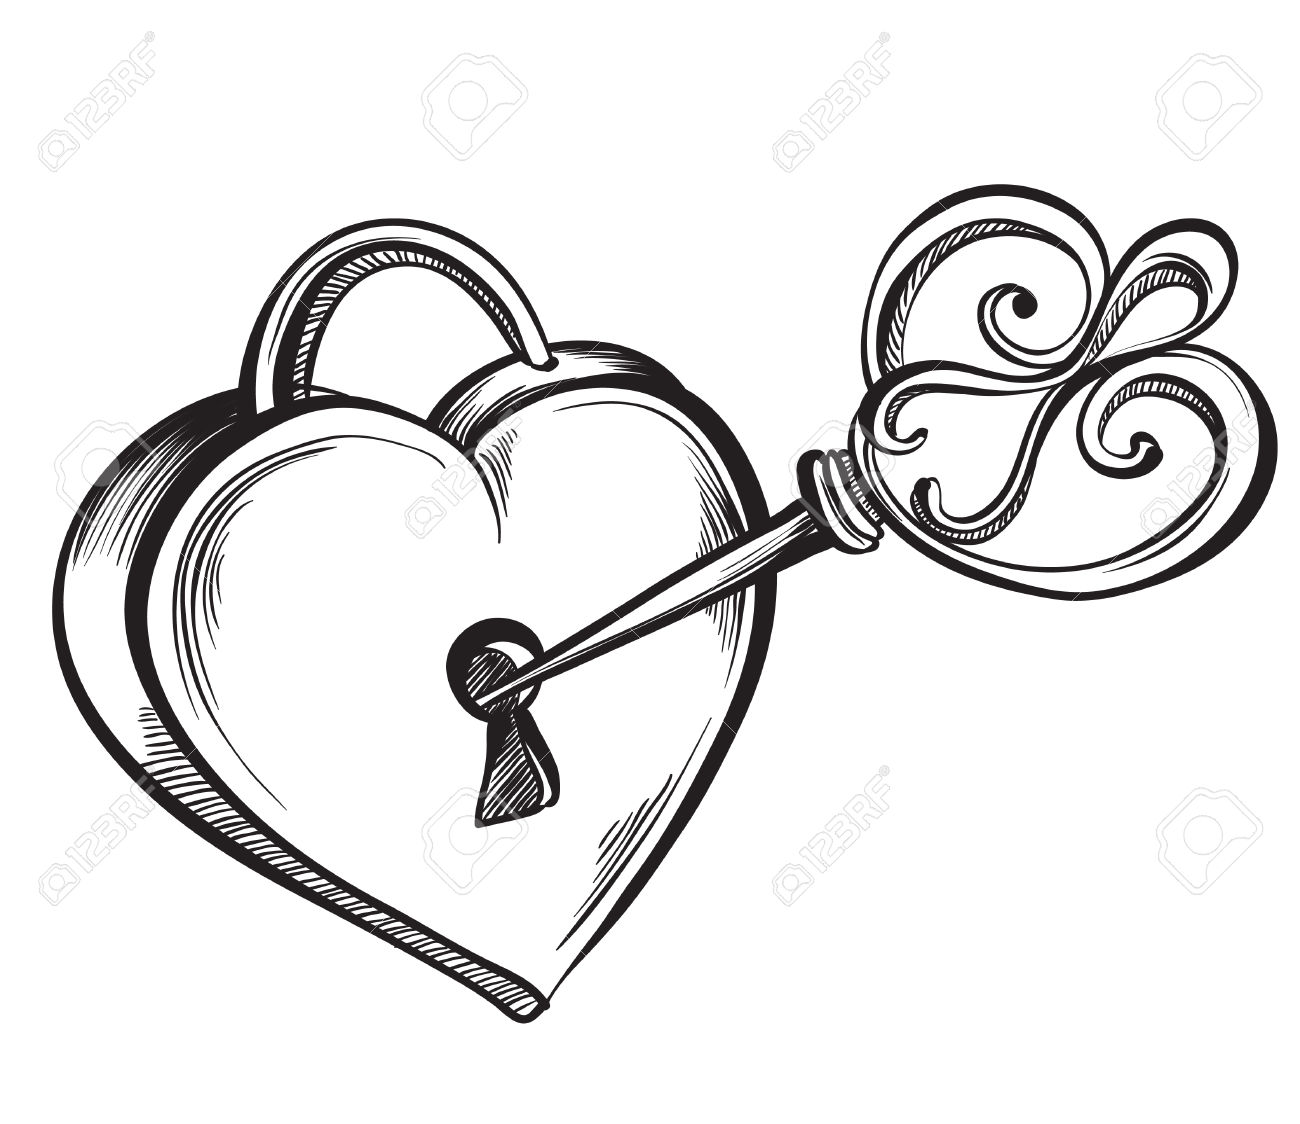 1300x1124 Drawn Heart Sketch